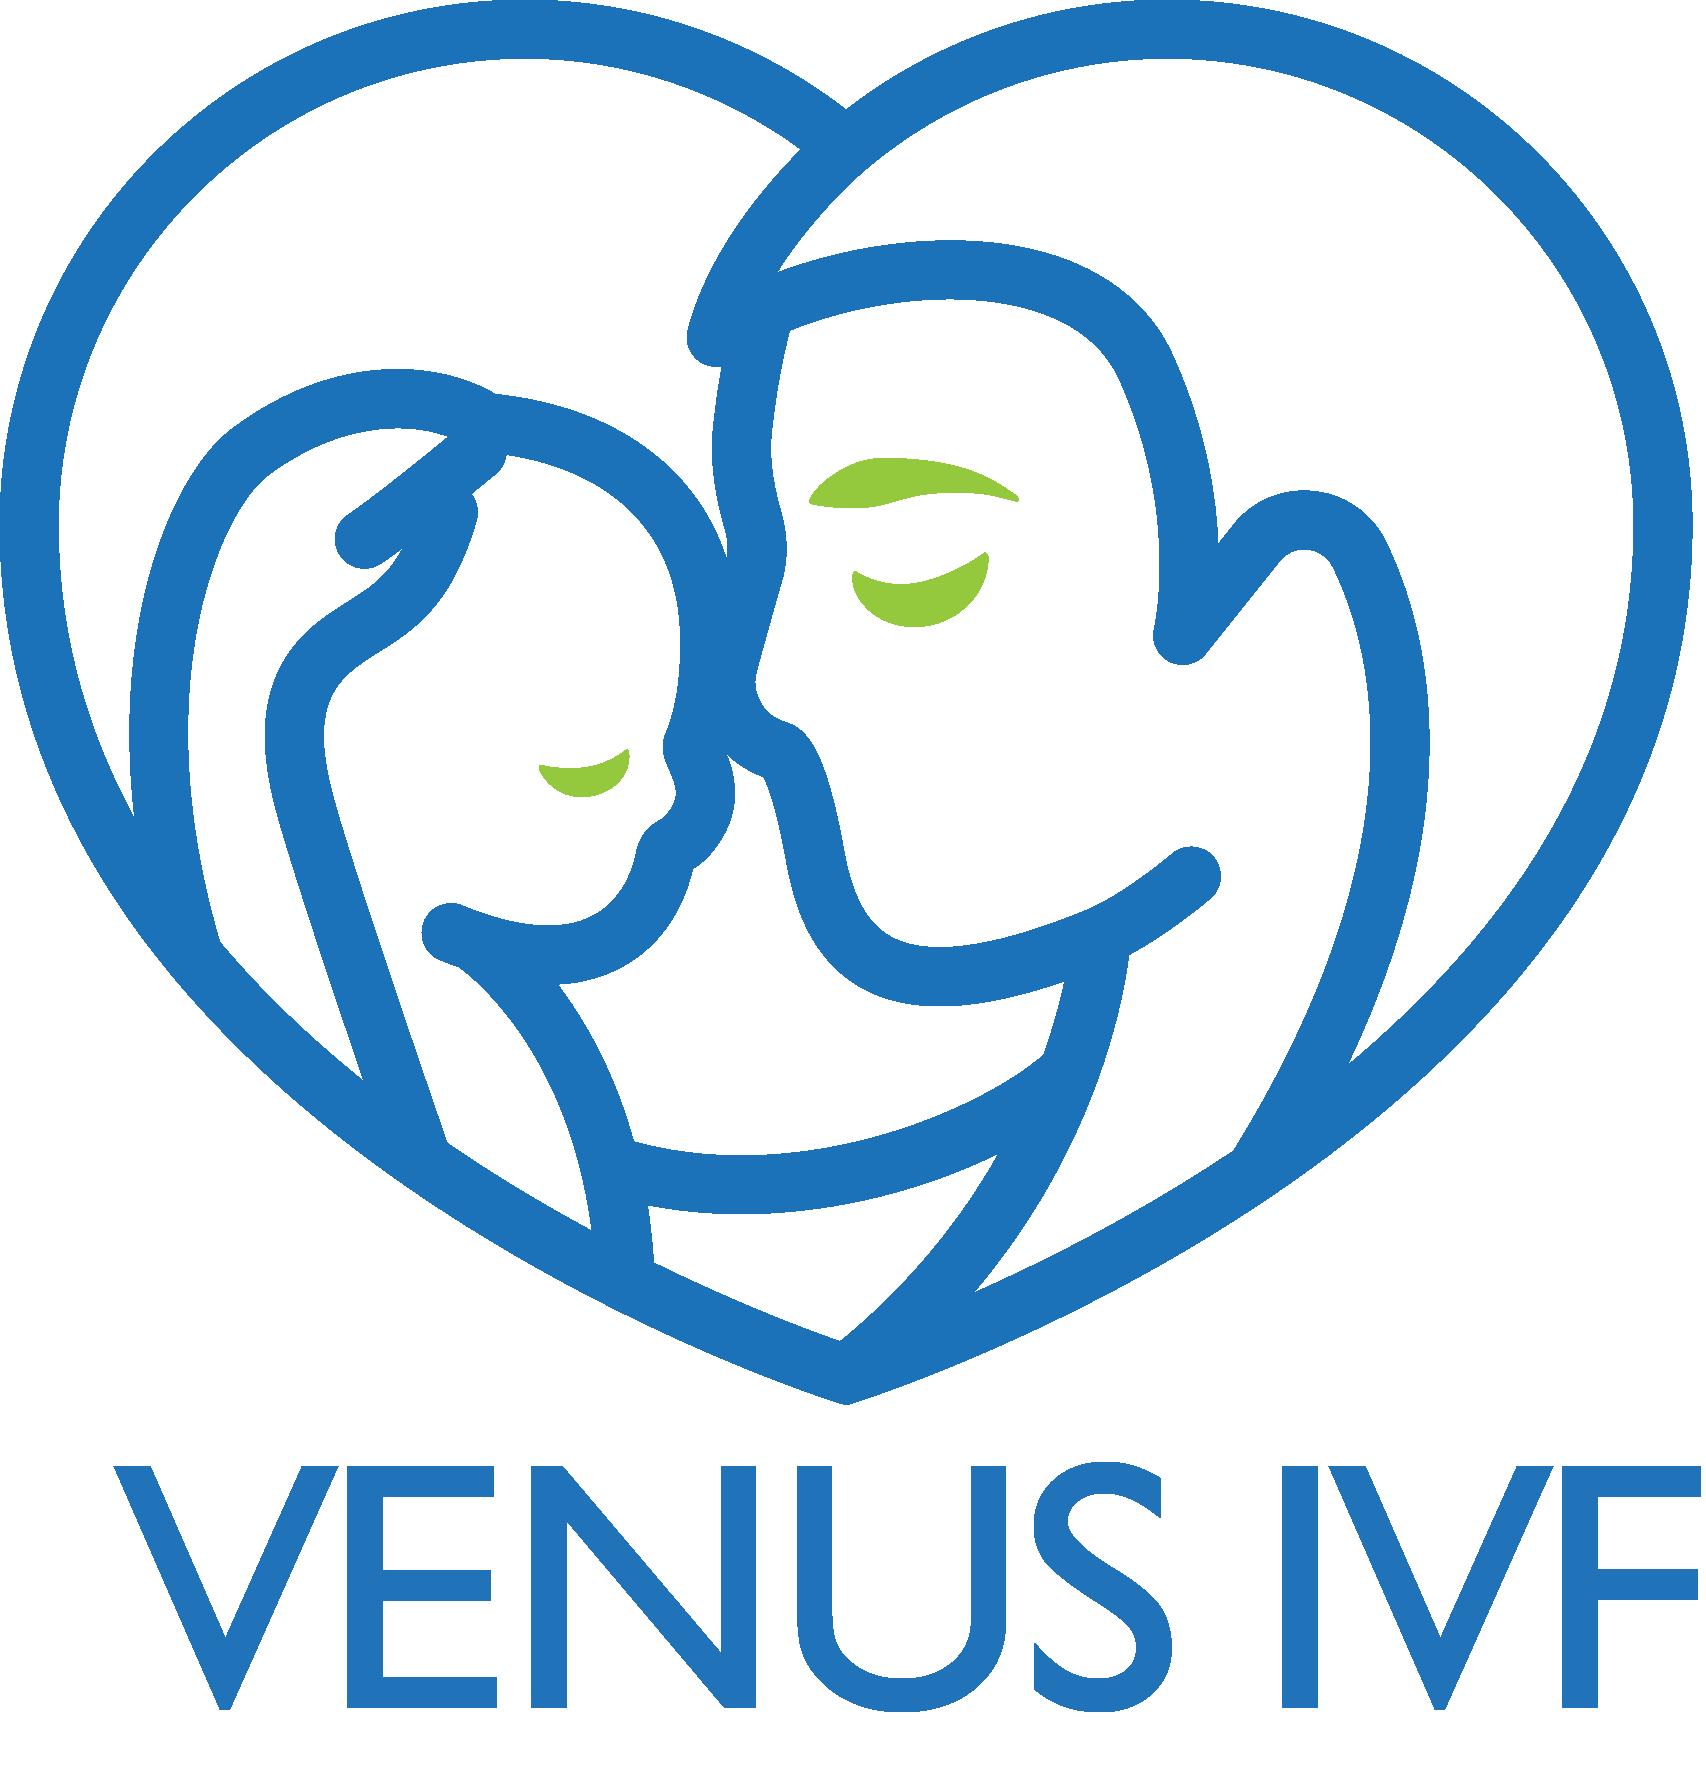 Venus ivf